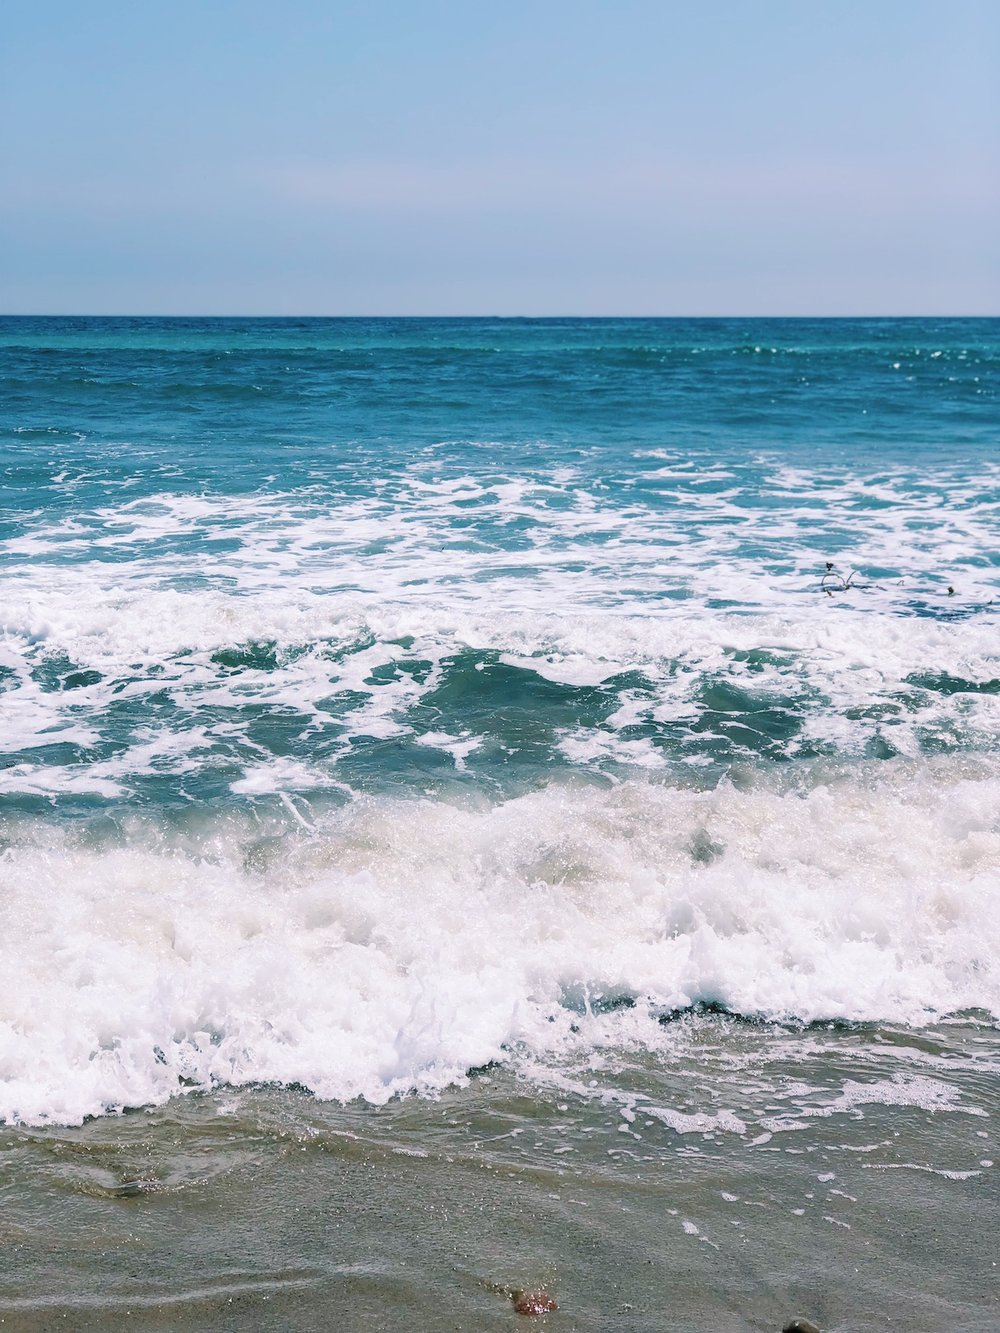 Ocean wave breaks on sand